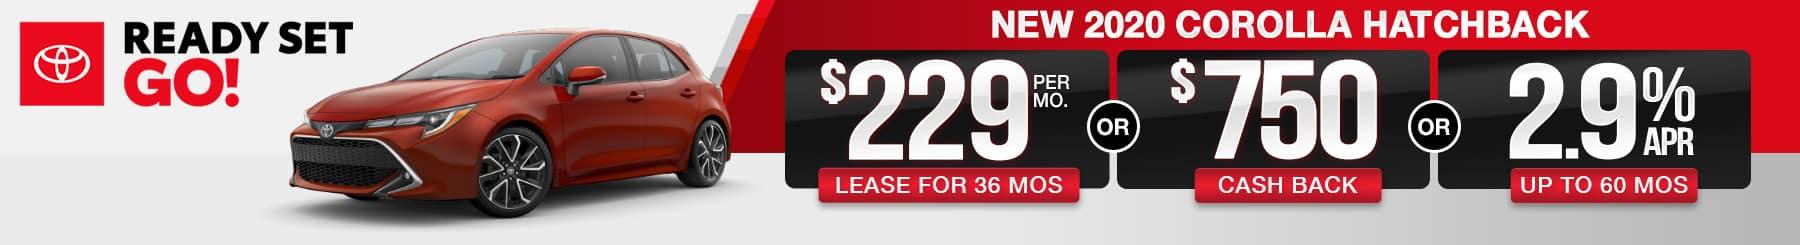 2020 Corolla Hatchback Lease or Finance Offers